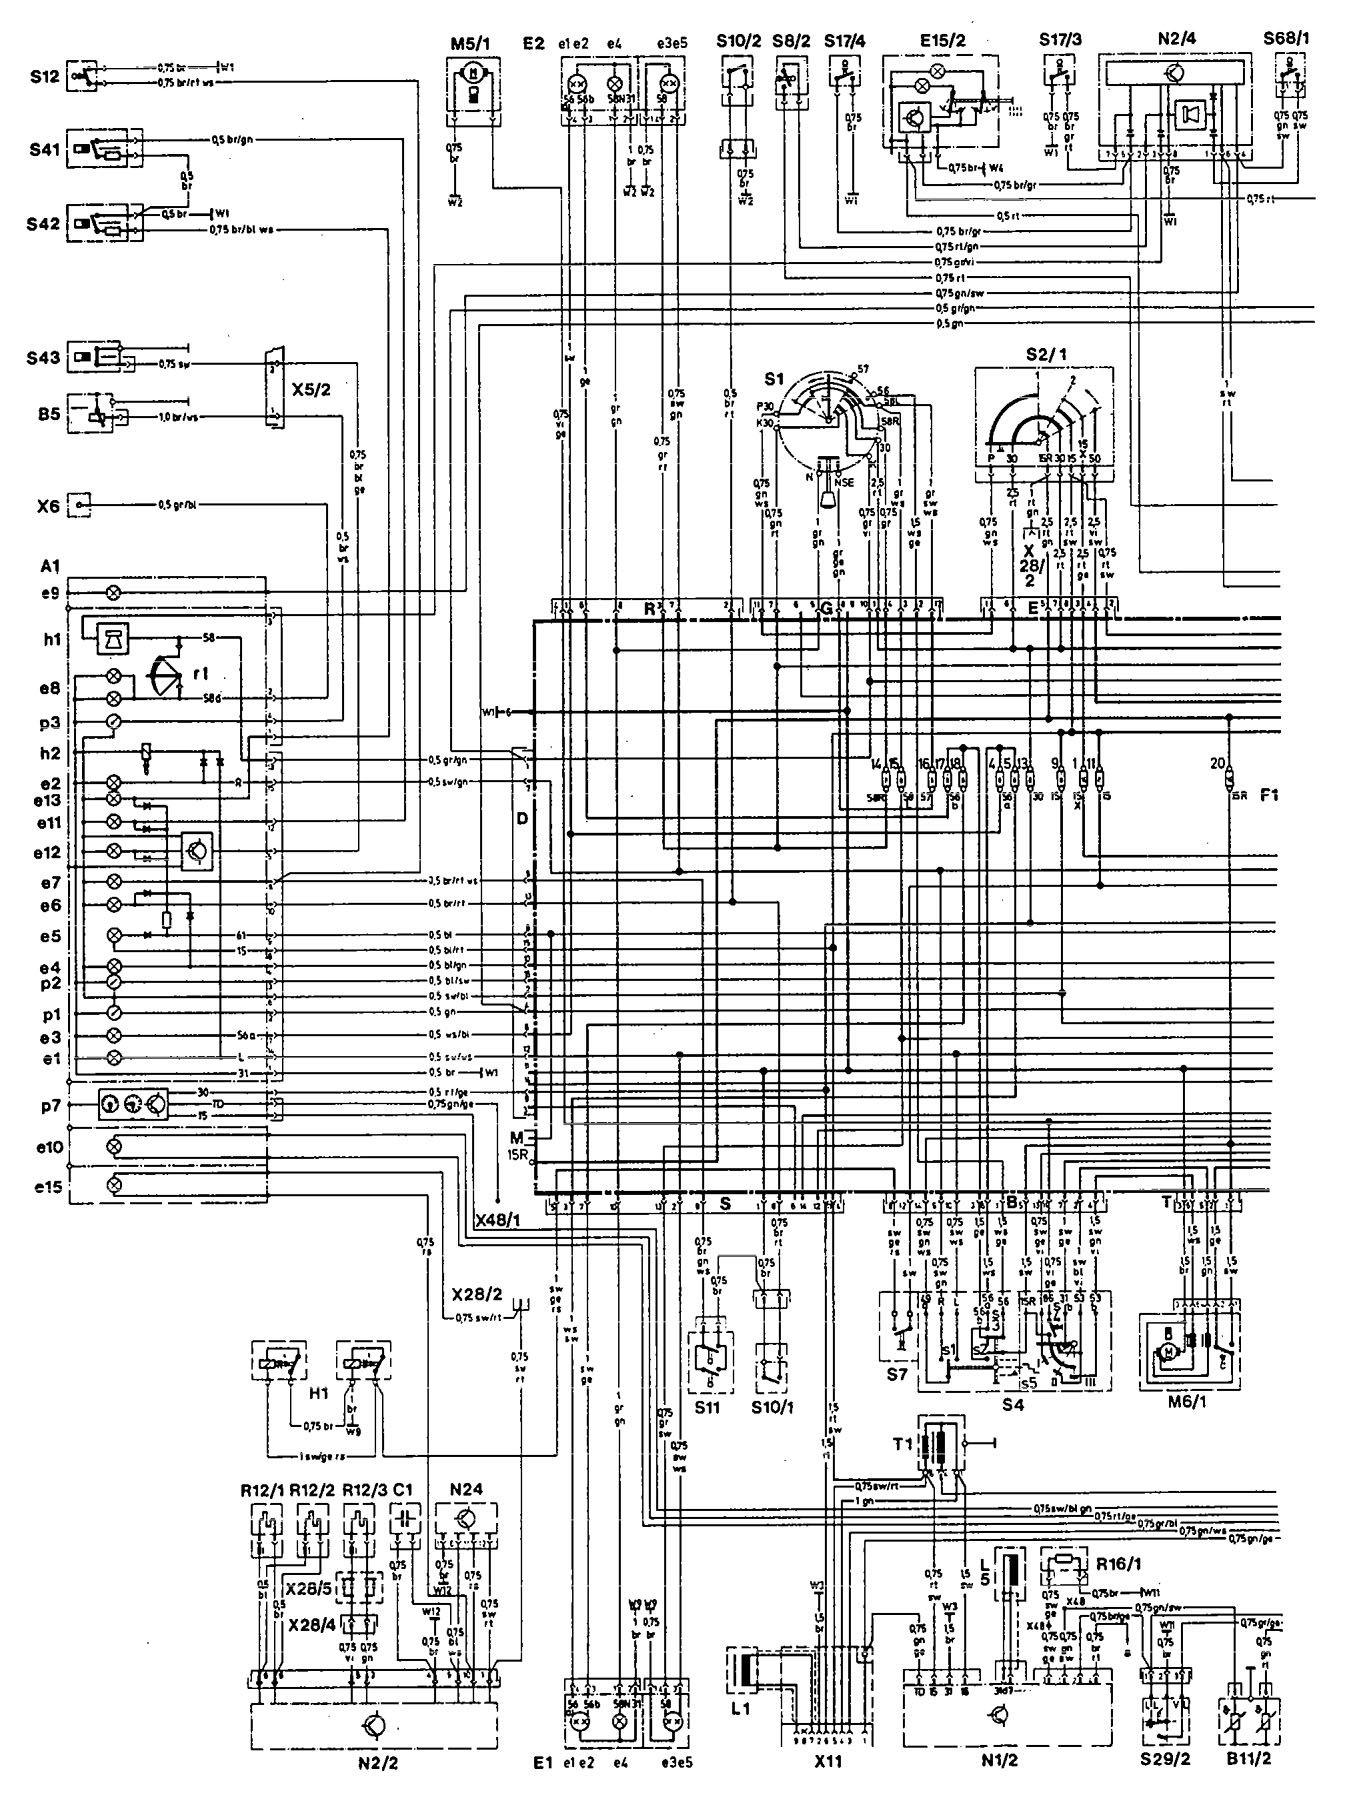 hight resolution of mercedes benz 190e 1993 wiring diagrams starting carknowledge 1993 mercedes benz 190e wiring diagram